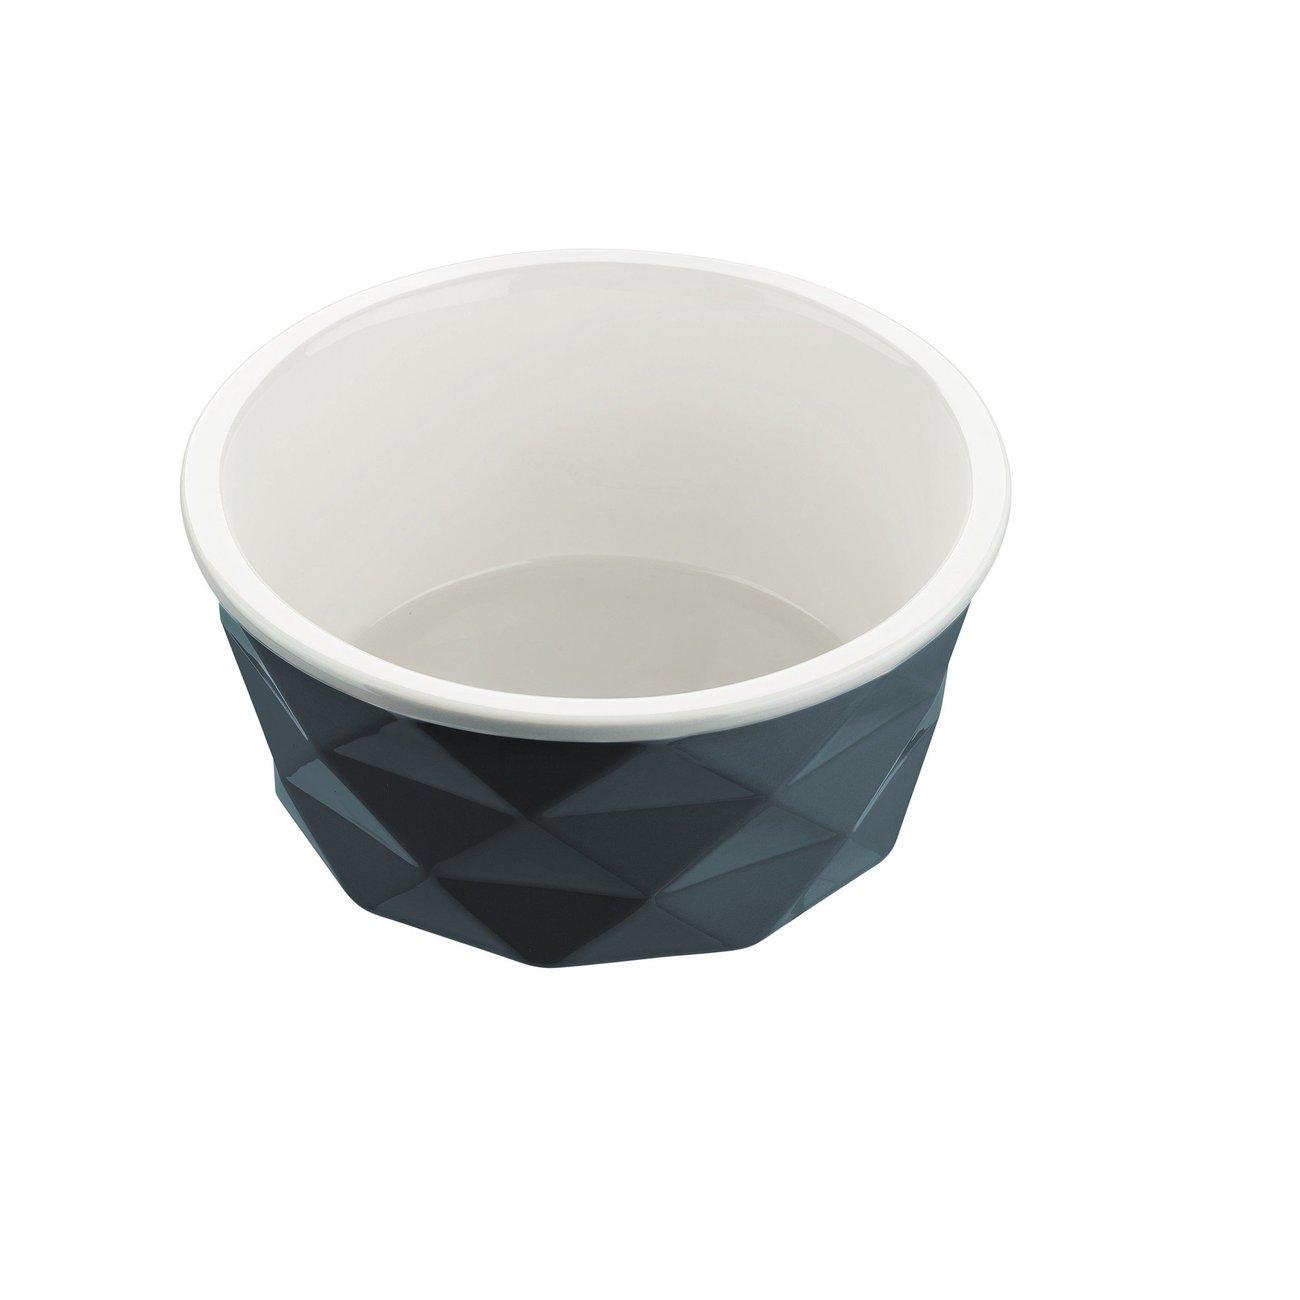 Hunter Keramik Napf Eiby 68648, Bild 3